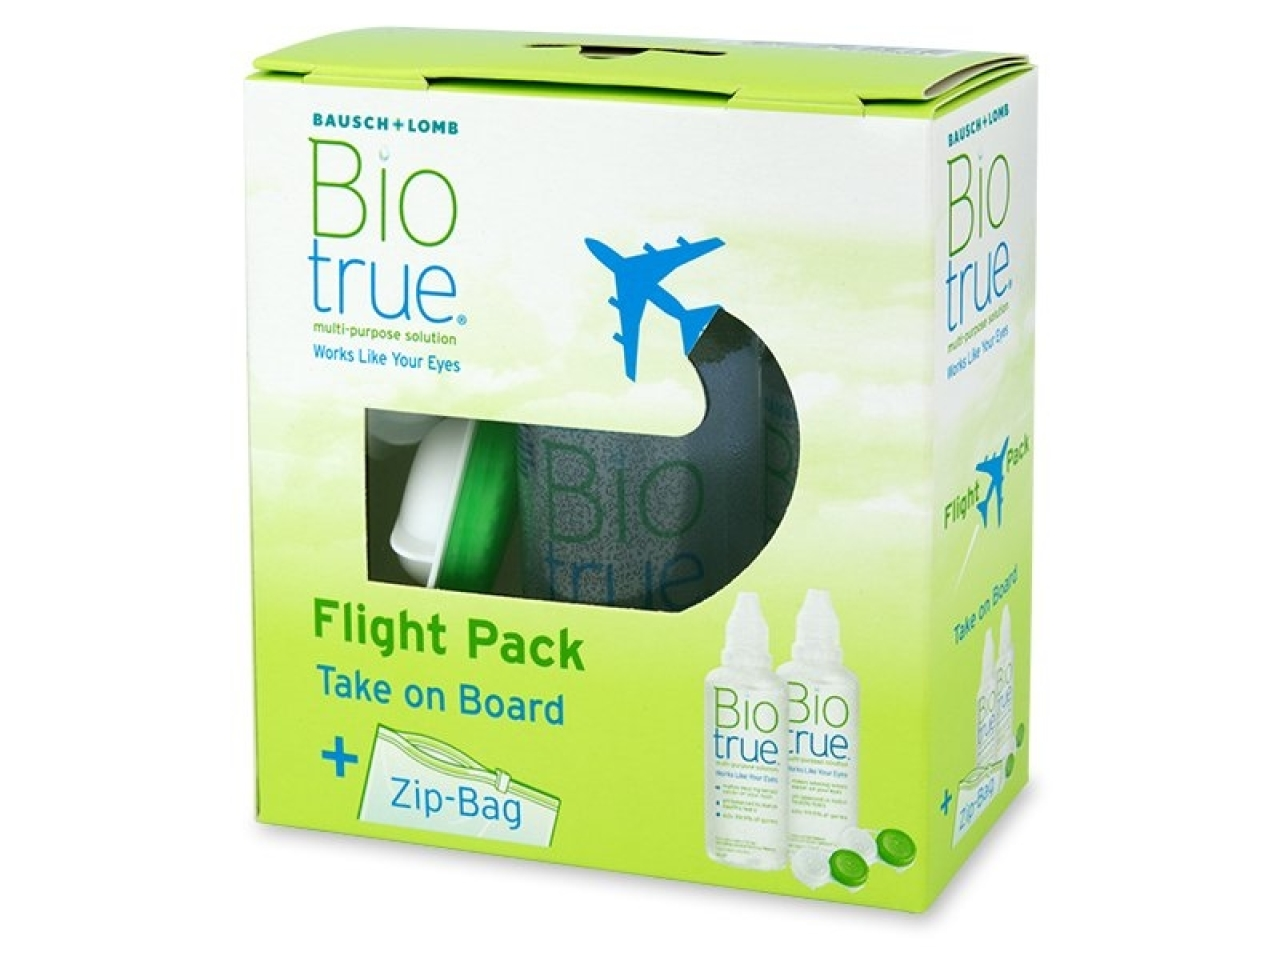 4dc894b7a Bausch & Lomb Biotrue Flight Pack 2x60ml od 5,88 € | Pricemania